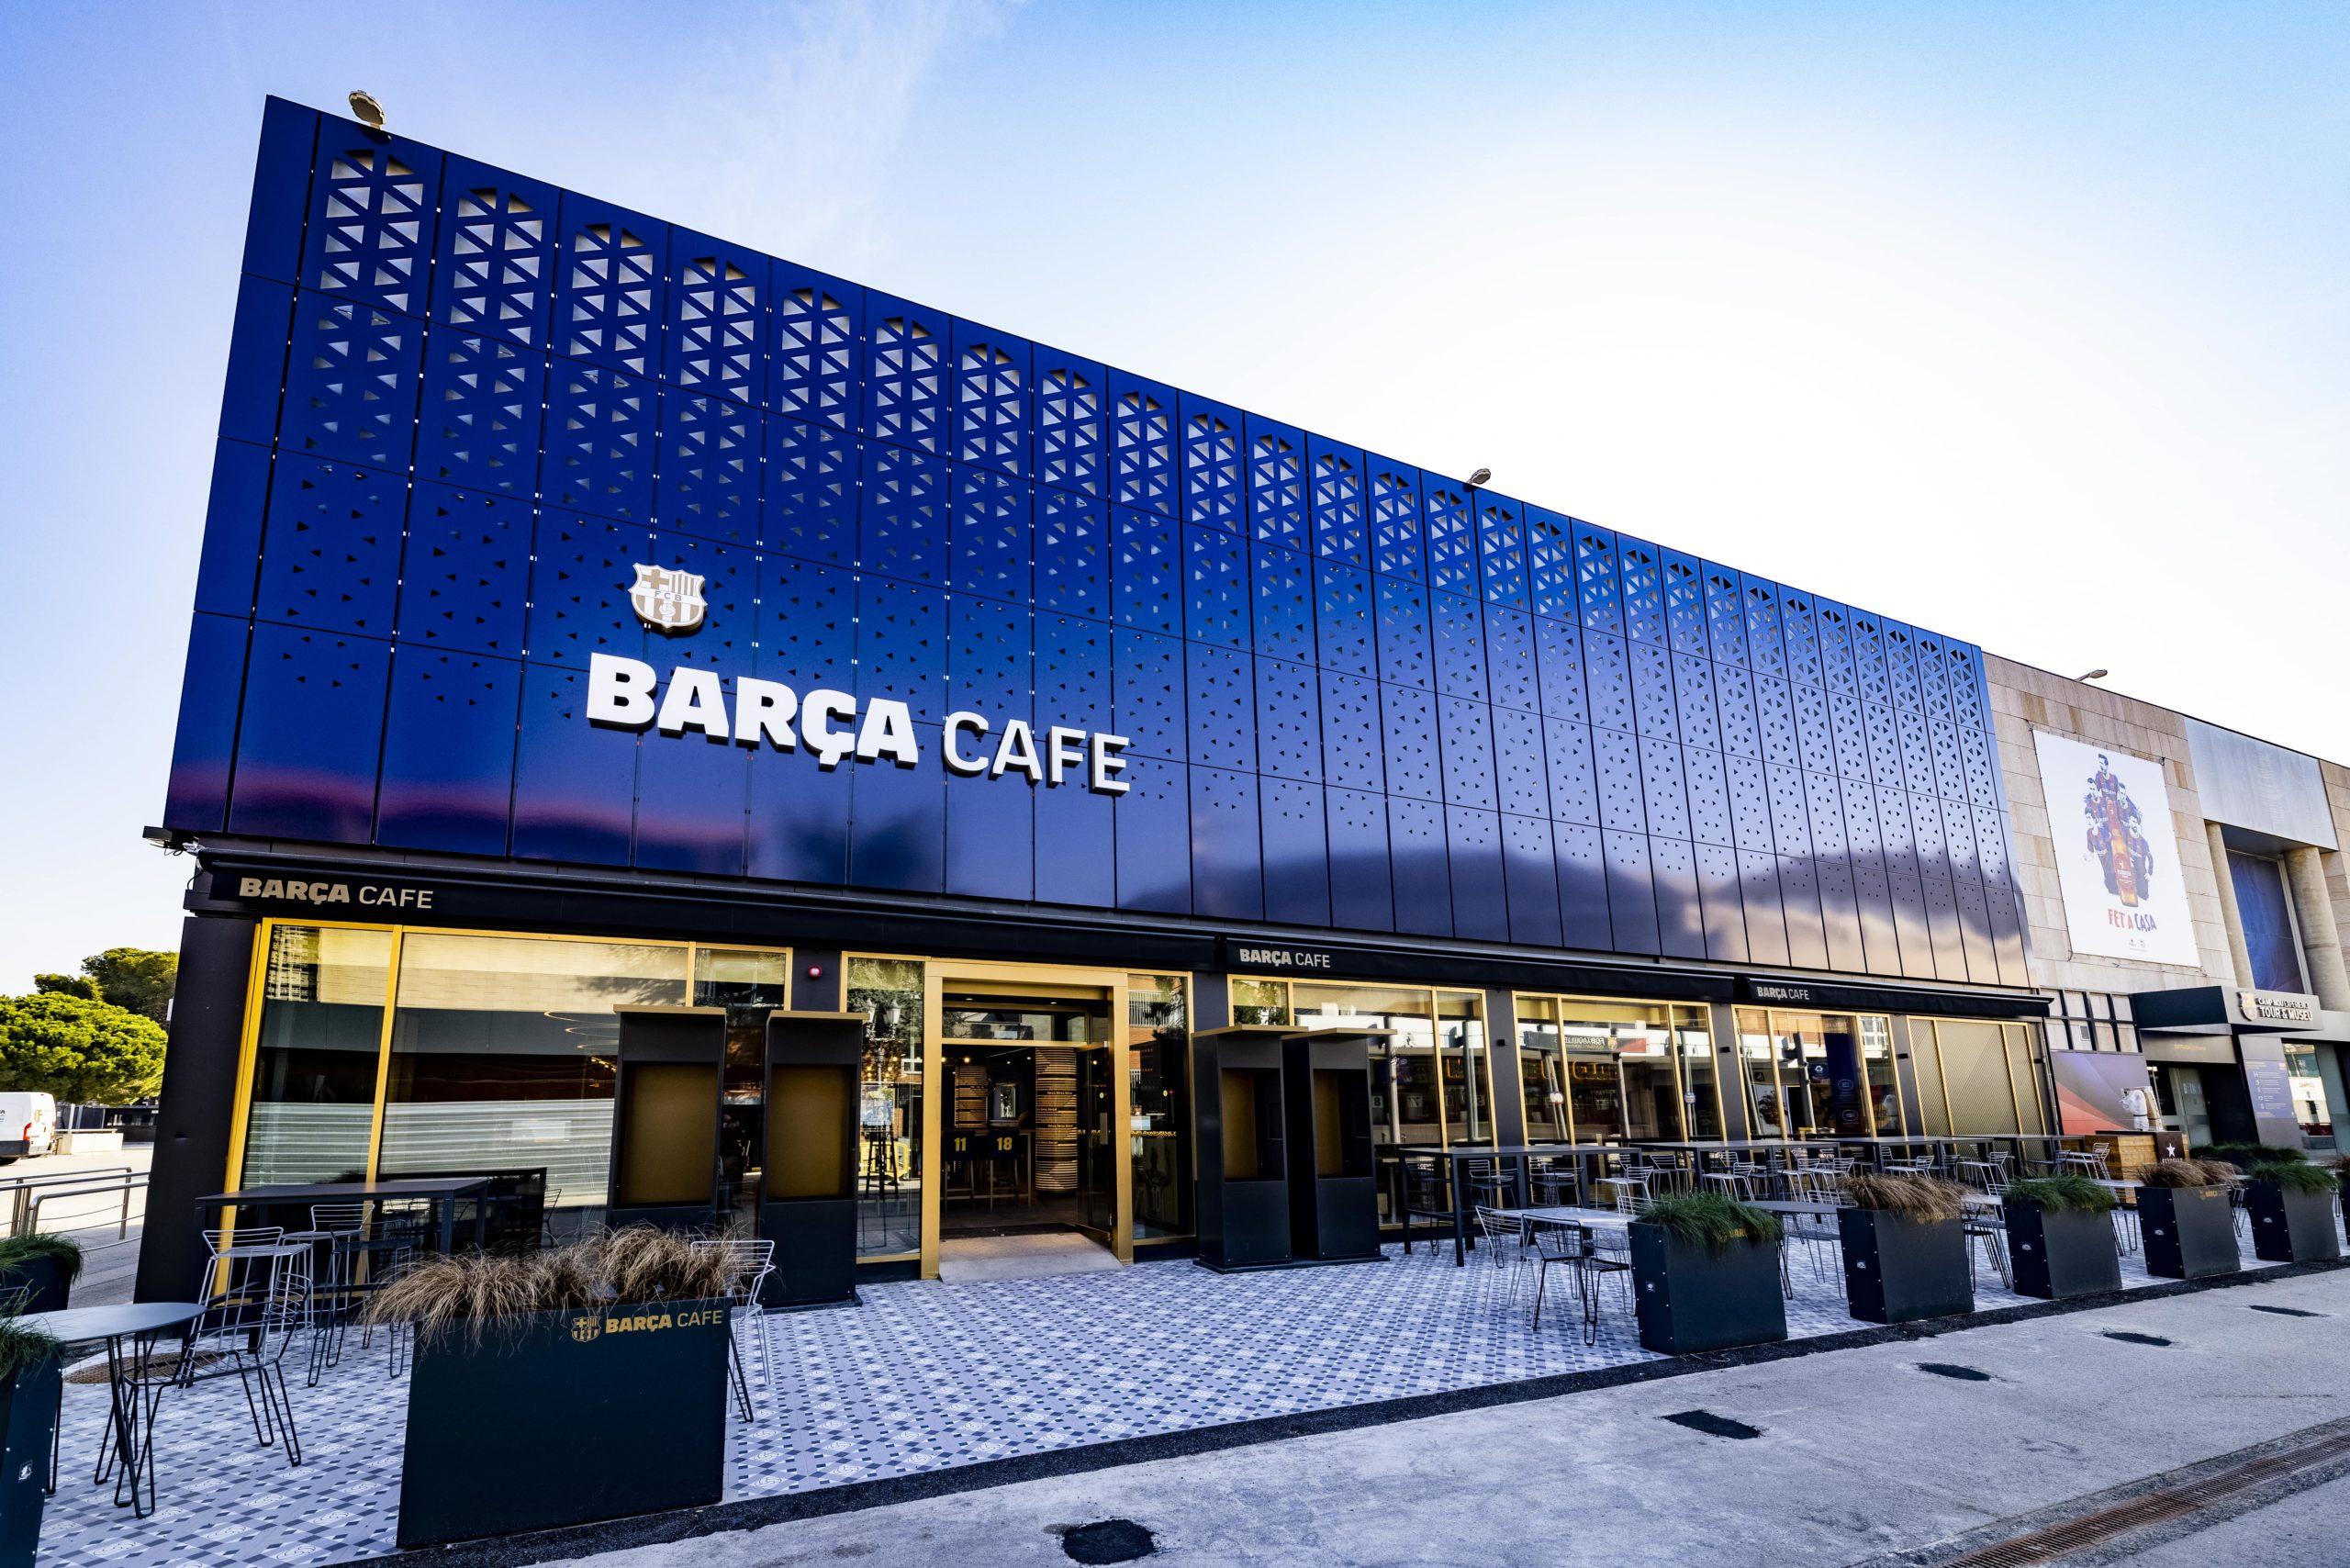 Singularis gestionará el Barça Cafe